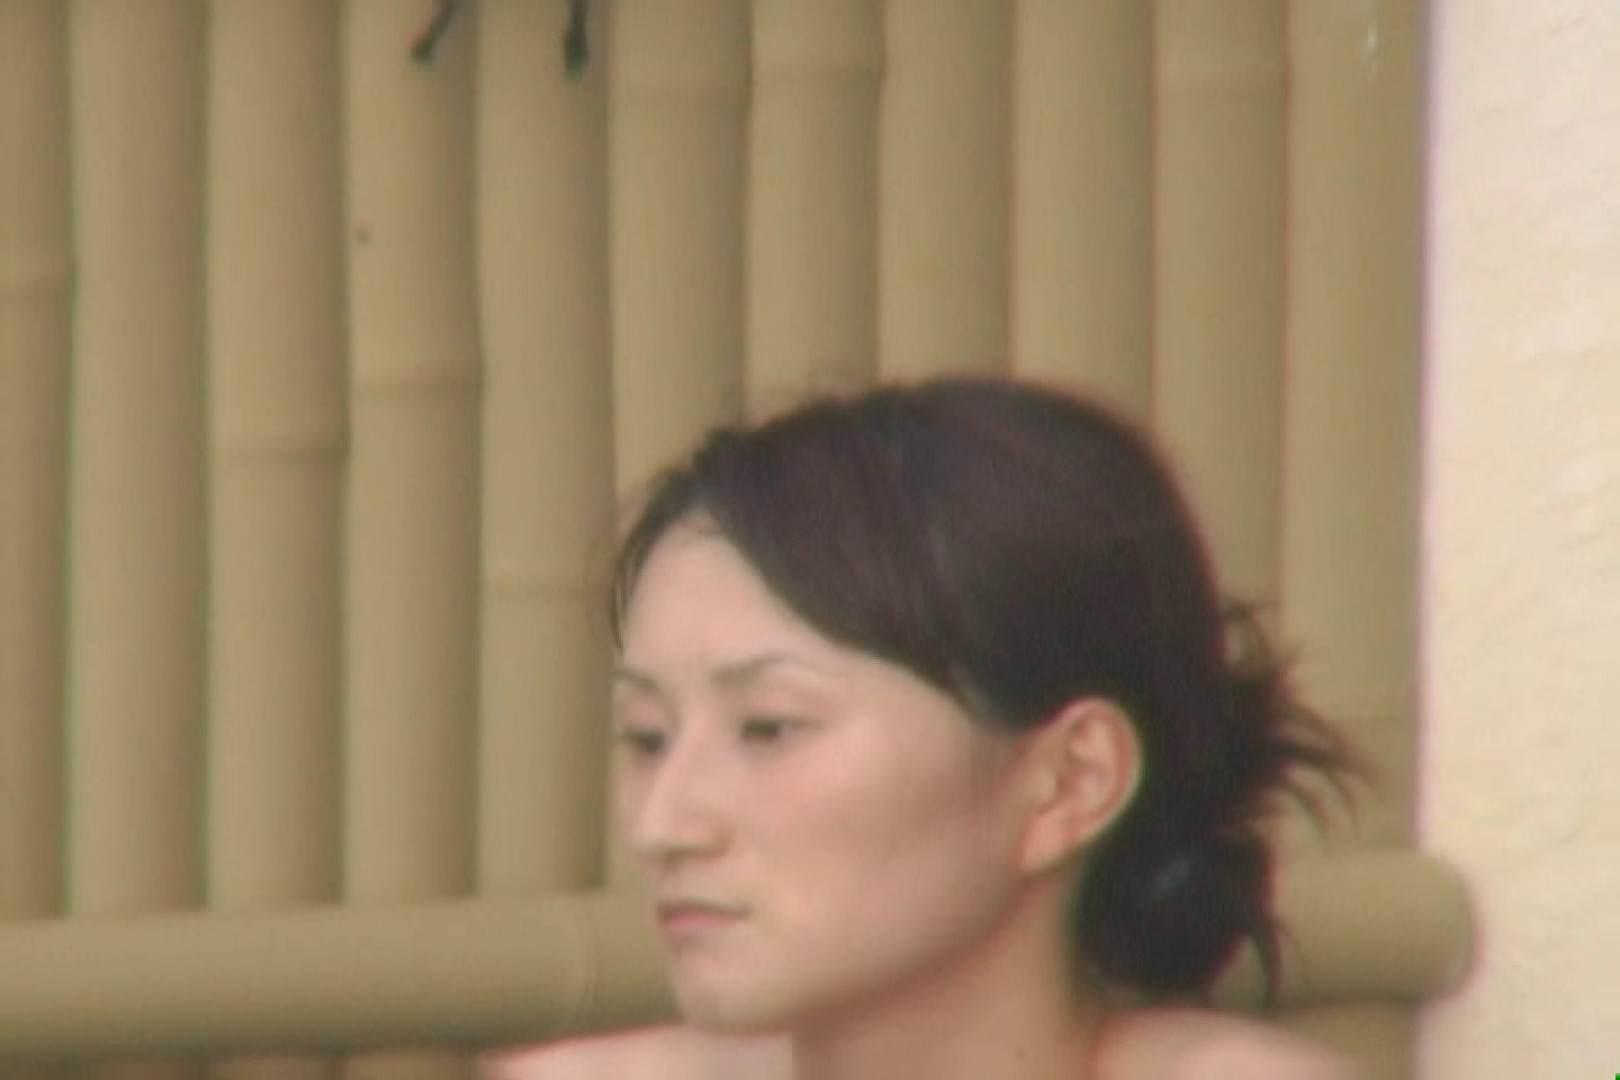 Aquaな露天風呂Vol.578 OLのプライベート  10pic 3